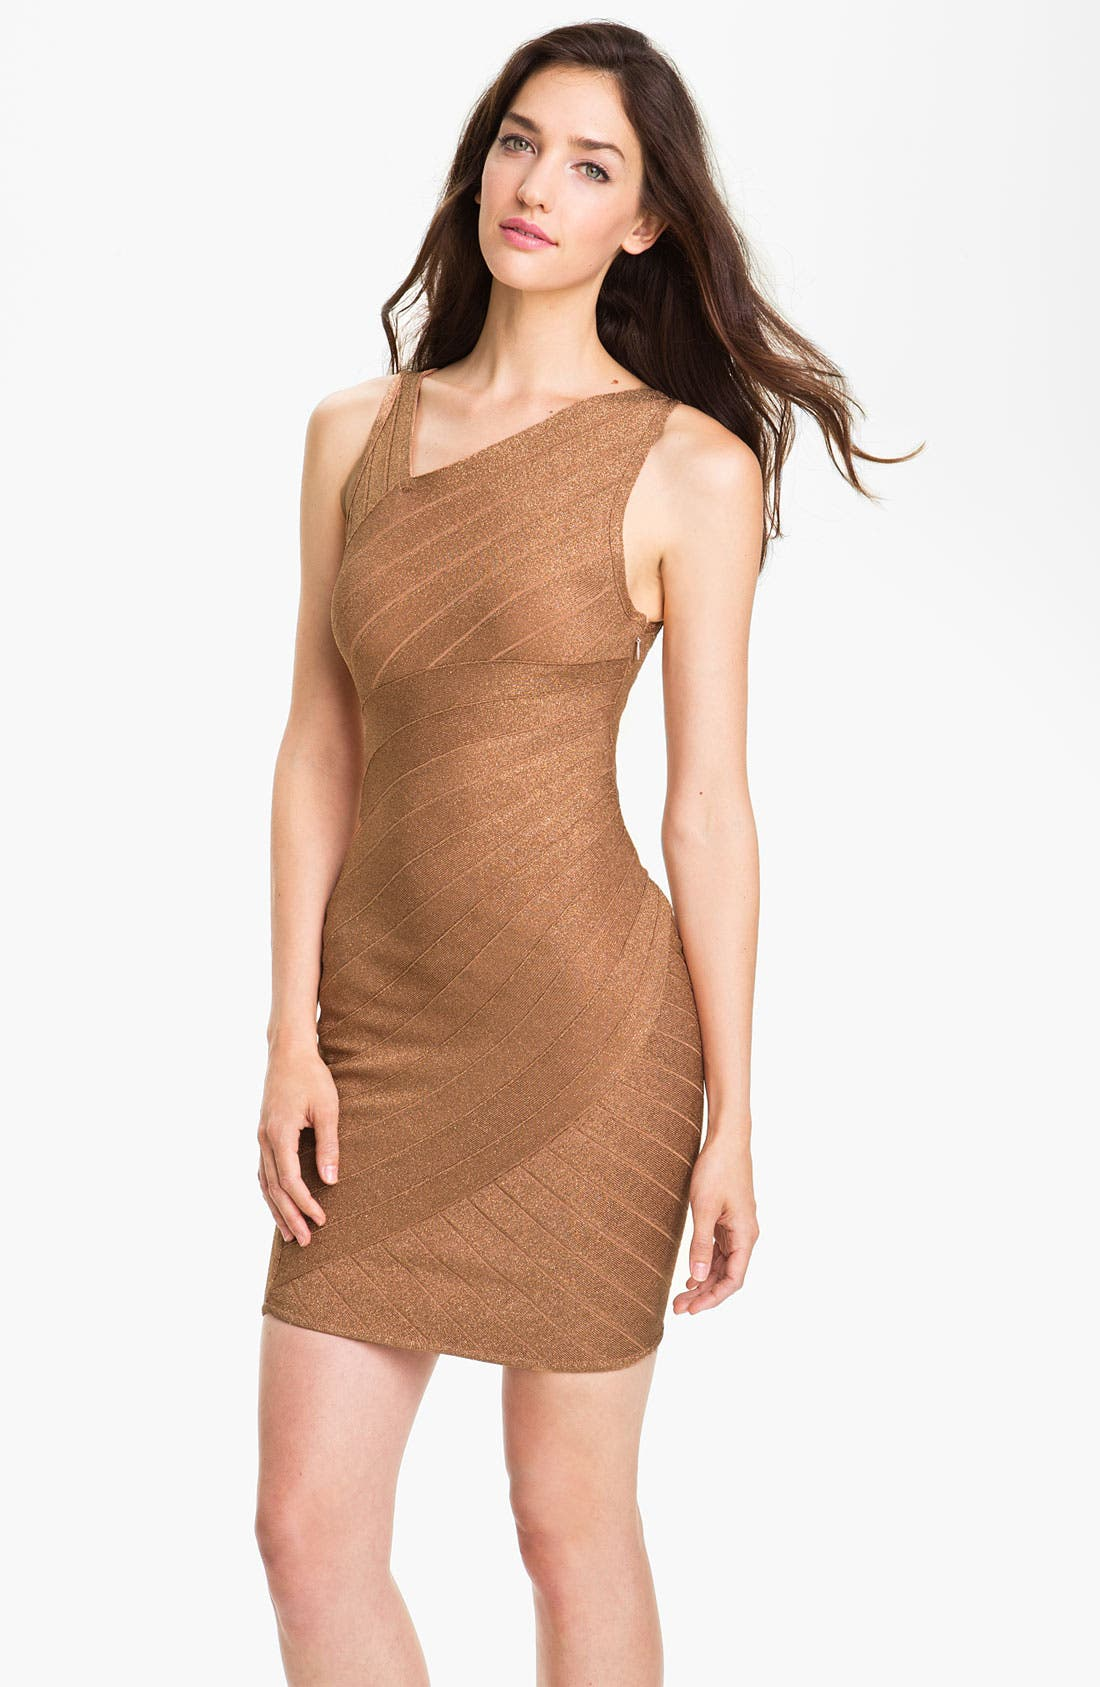 Alternate Image 1 Selected - JS Collections Asymmetrical Metallic Bandage Dress